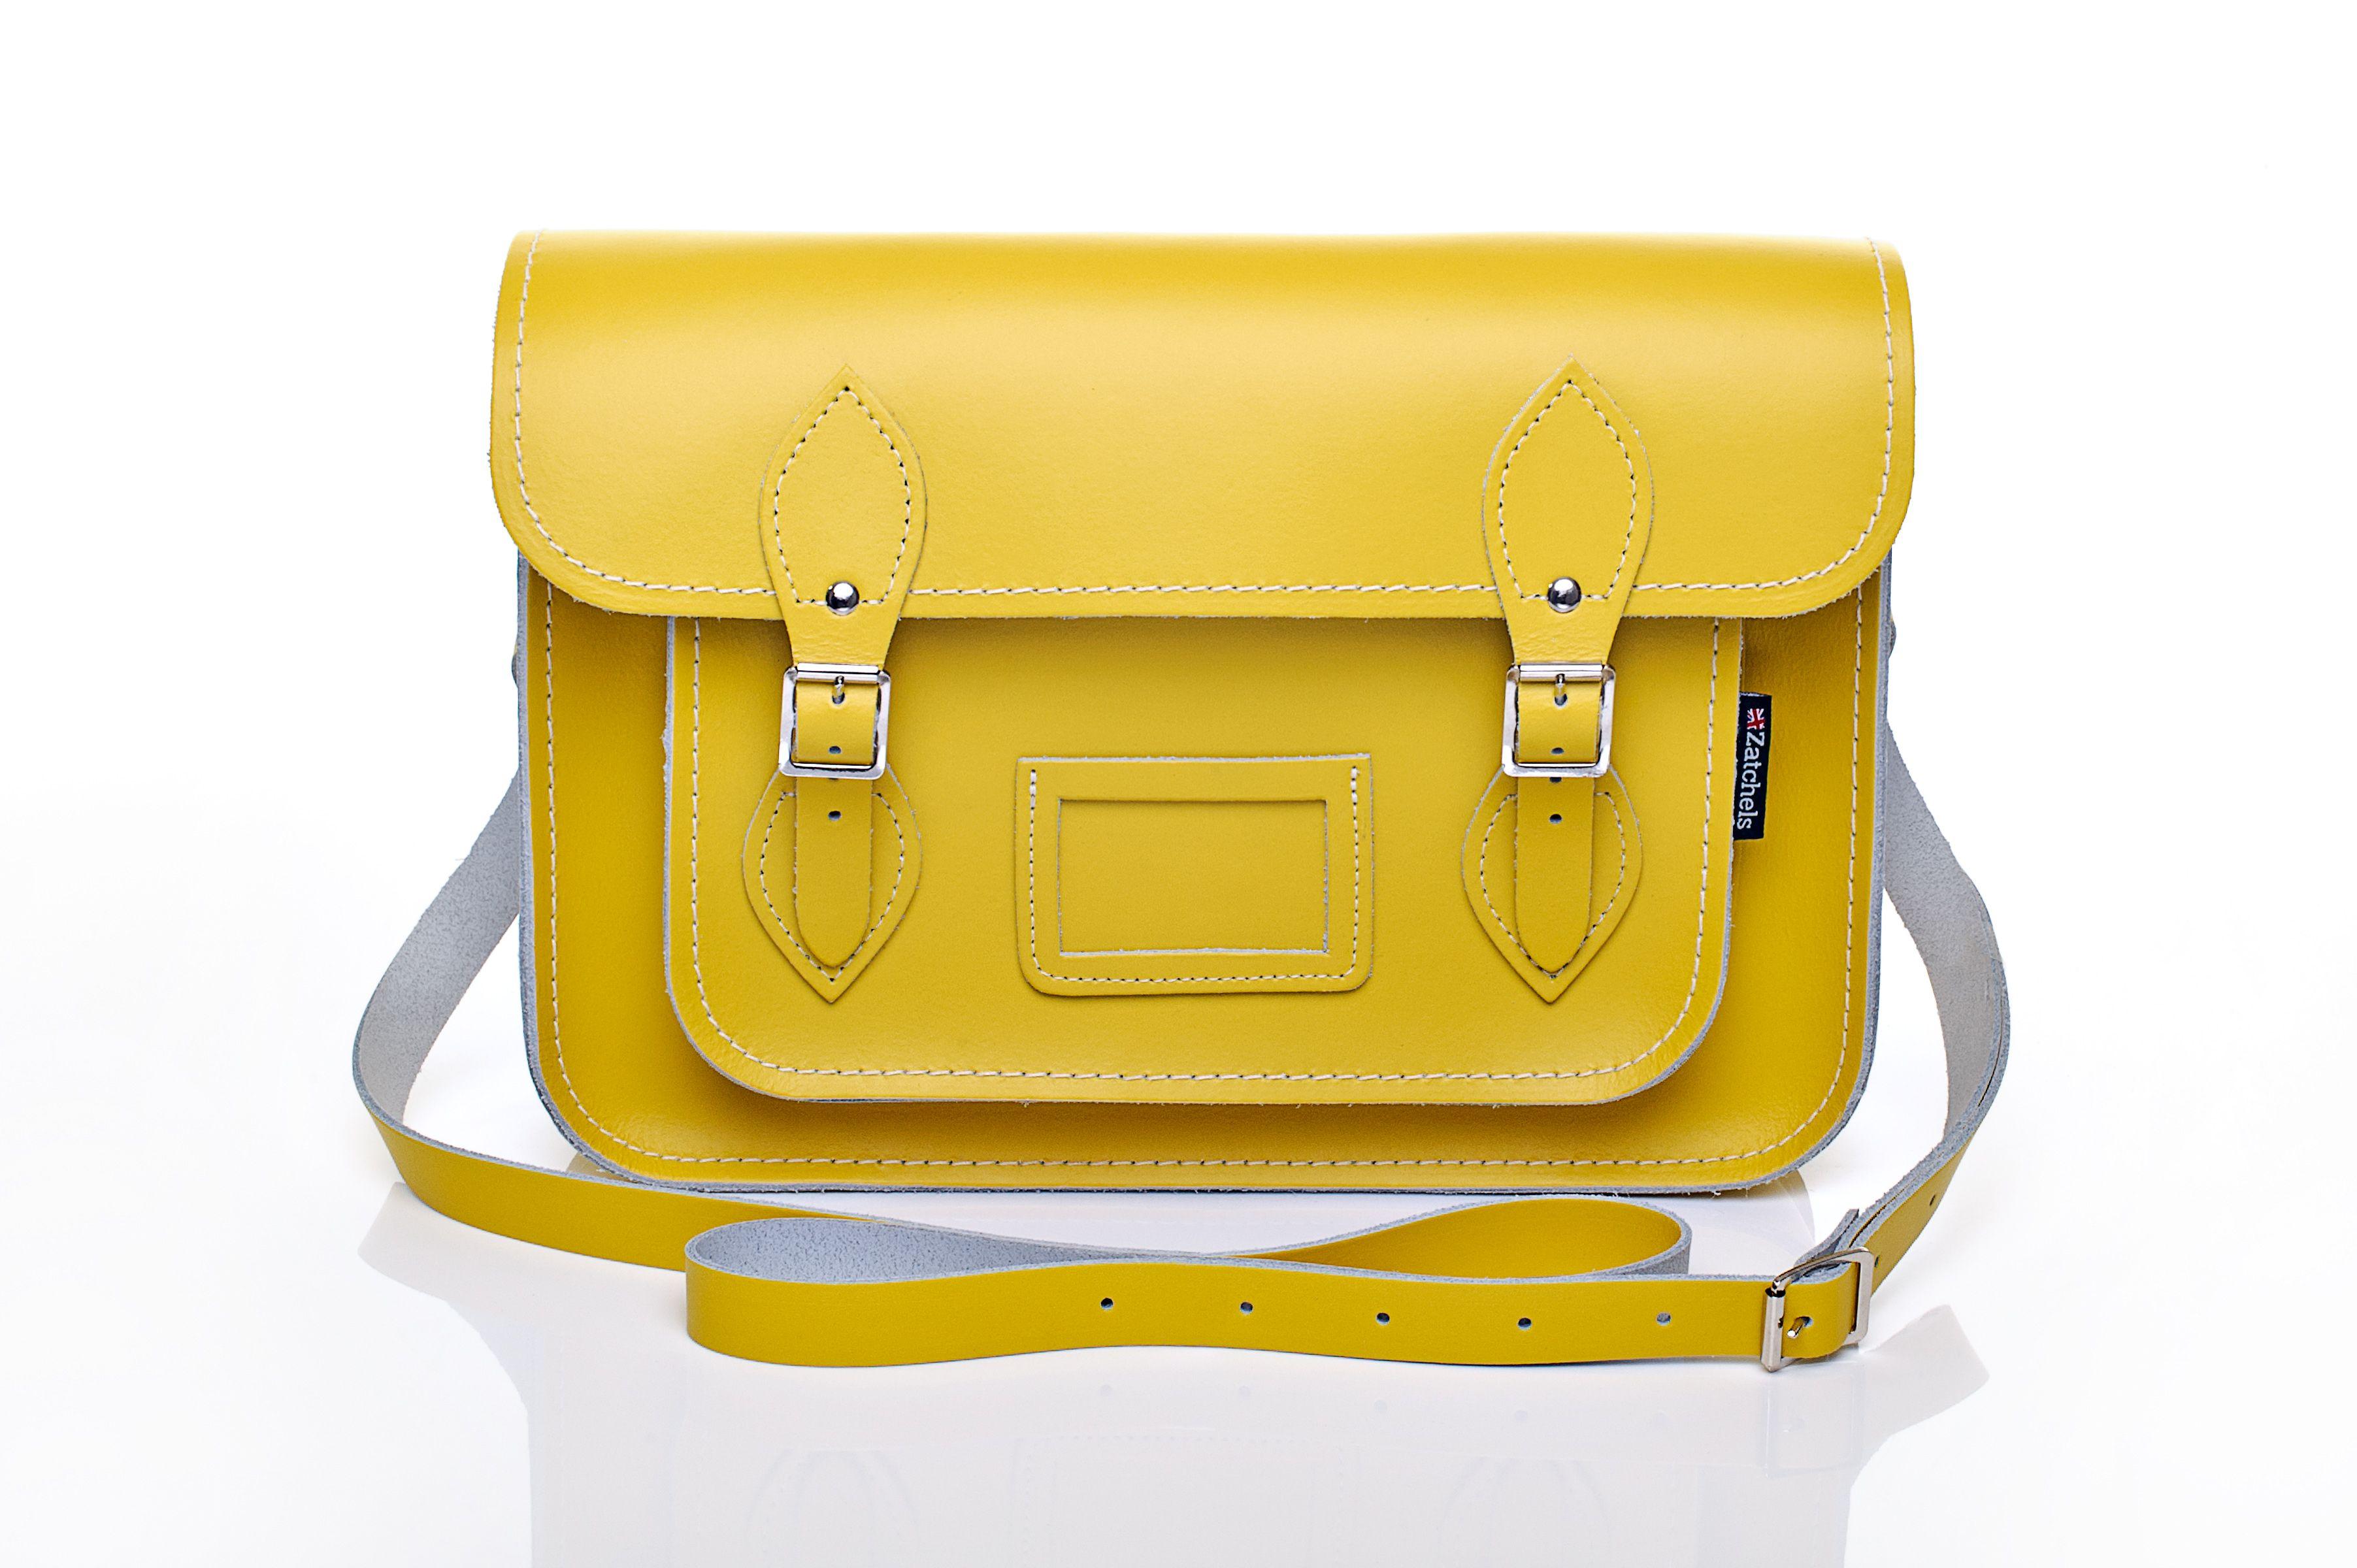 Zatchels Pastel Daffodil Yellow Satchel #springwishlist #pastels #SS14 #spring #summer #fashion #style #zatchels #leather #accessories #satchel #bag #trend #pasteltrend